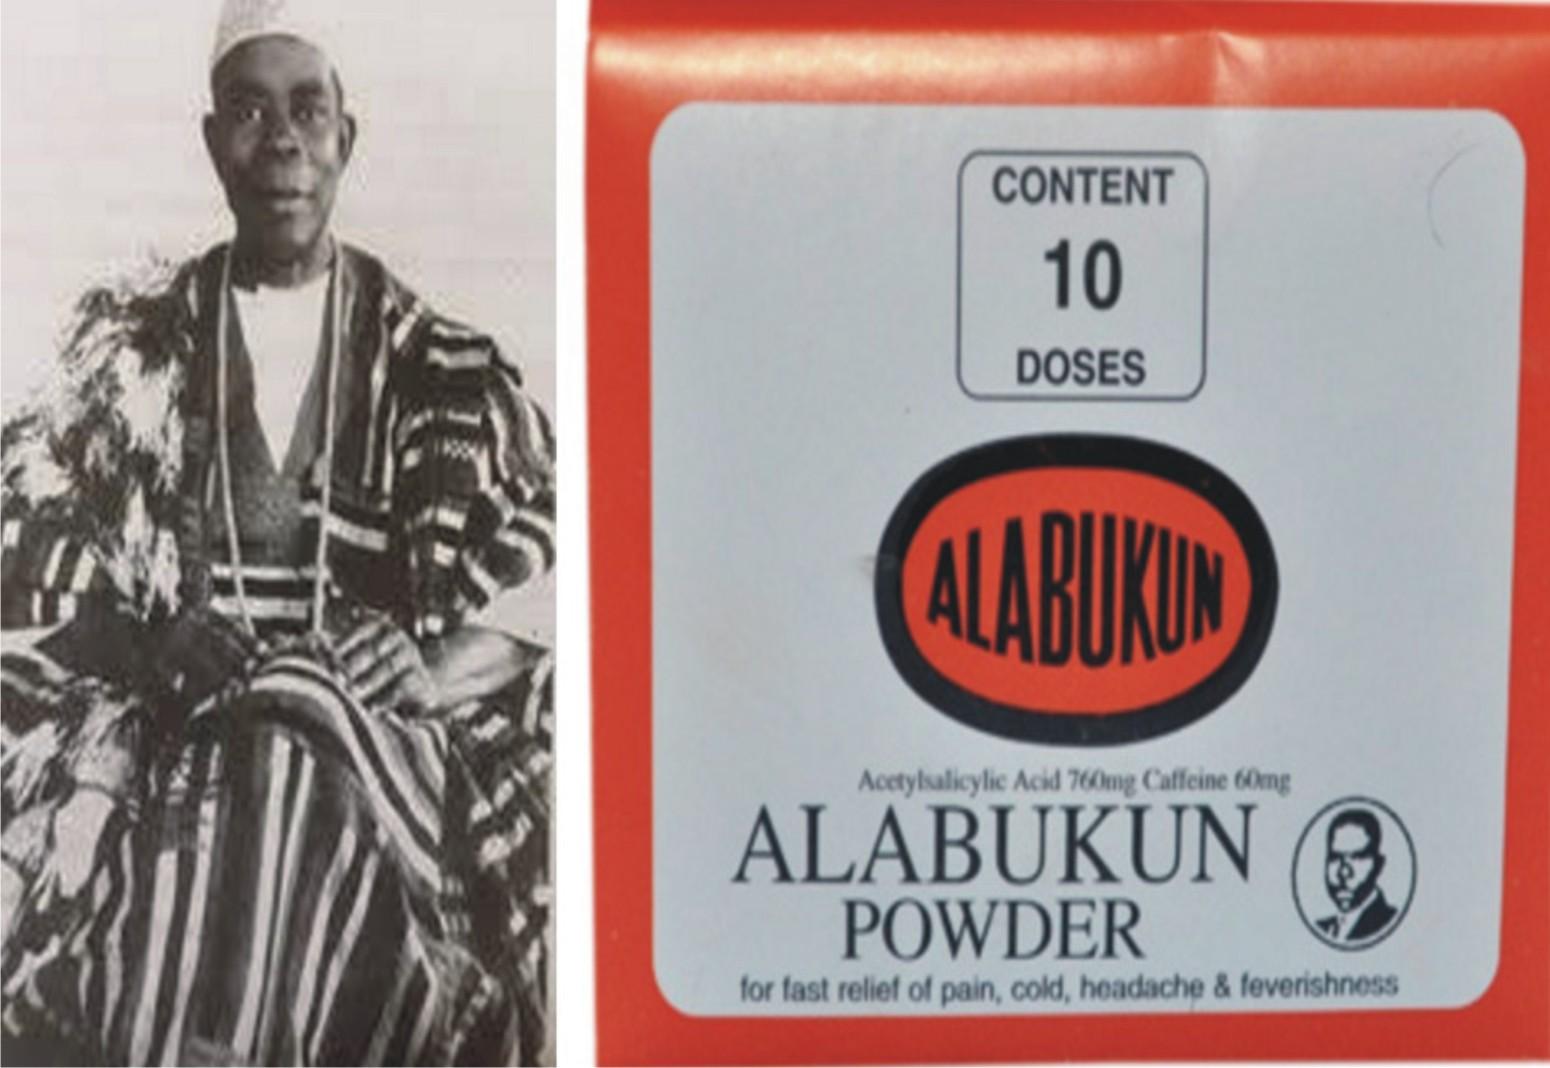 Jacob Odulate, the man who invented Alabukun powder